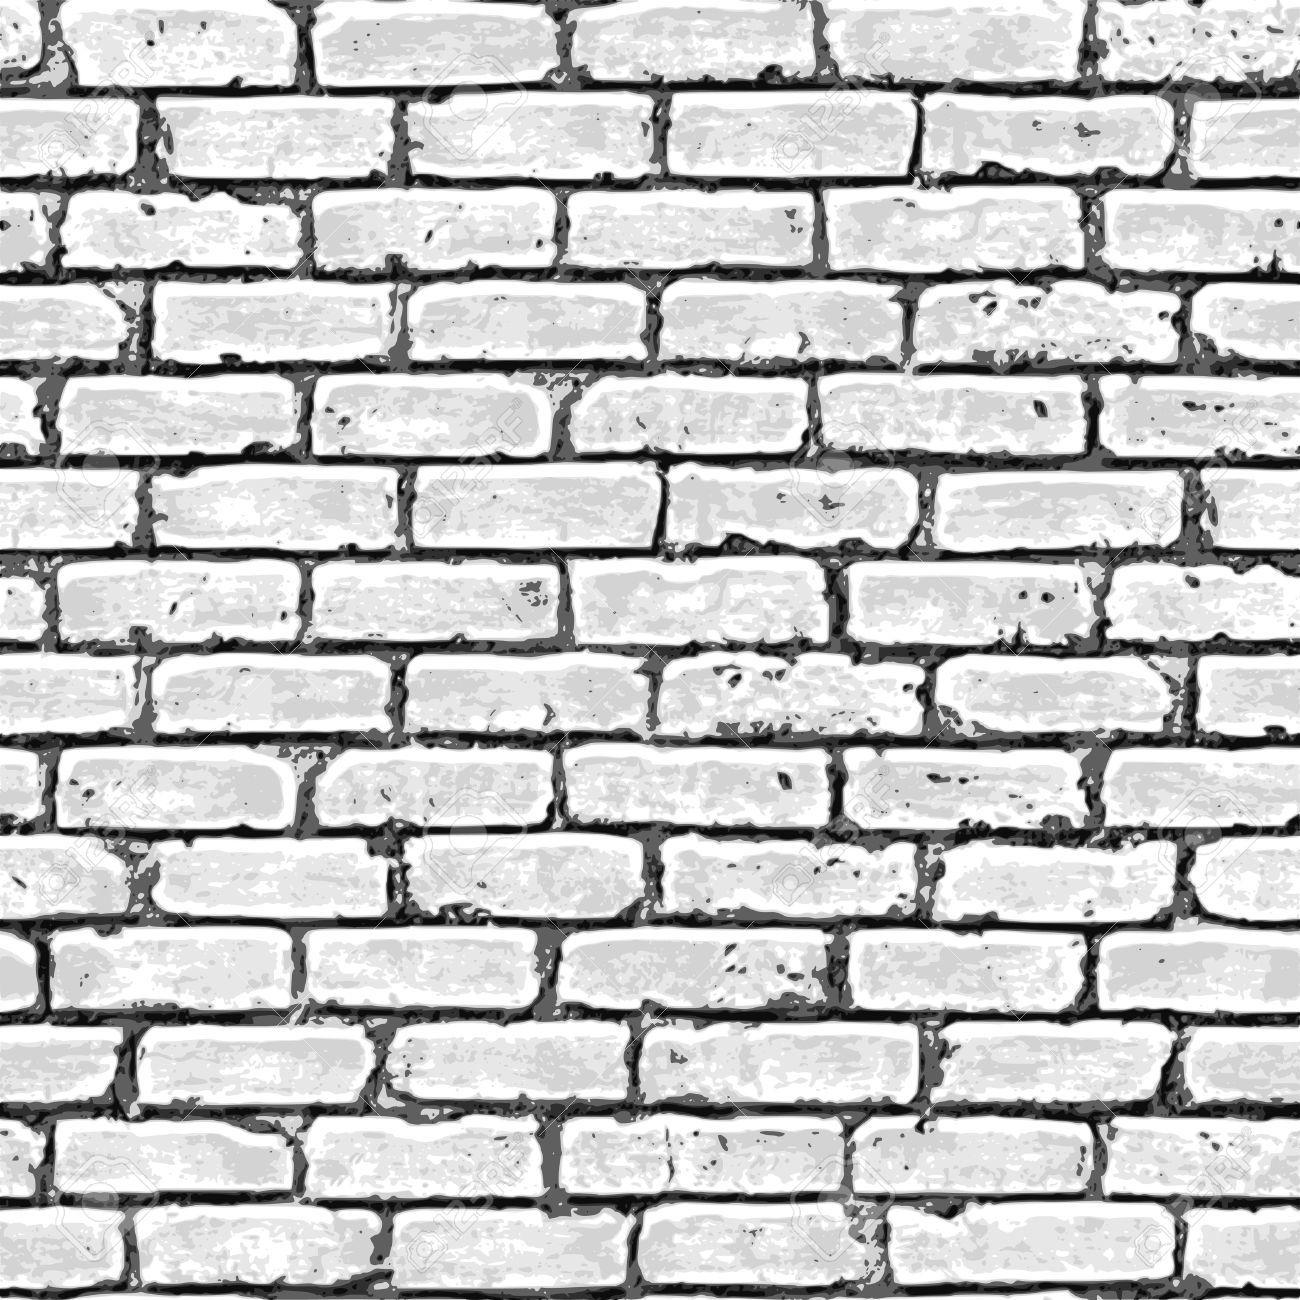 Brick Wall Seamless Pattern Vector Illustration Illustration Ad Seamless Wall Brick Pattern Illustrati Brick Wall Brick Patterns Brick Wallpaper